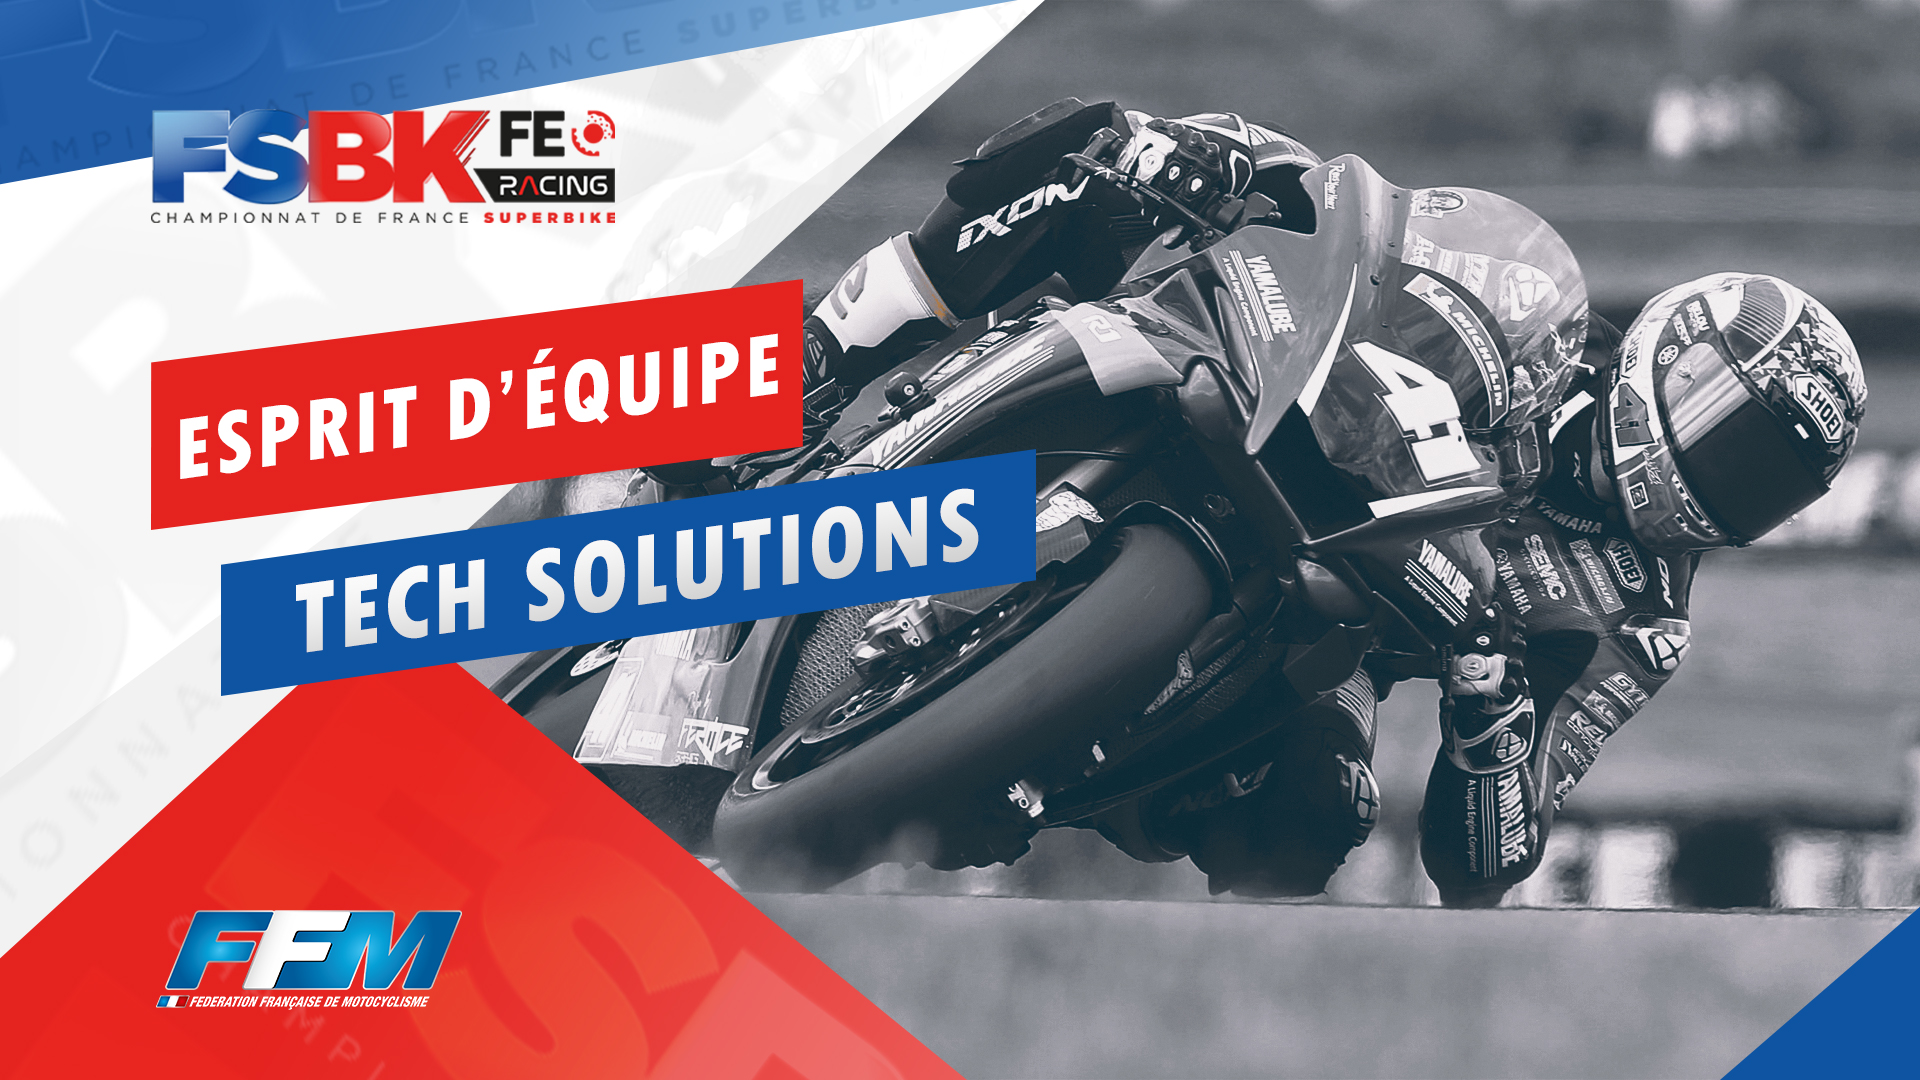 // ESPRIT D'EQUIPE TECH SOLUTIONS //